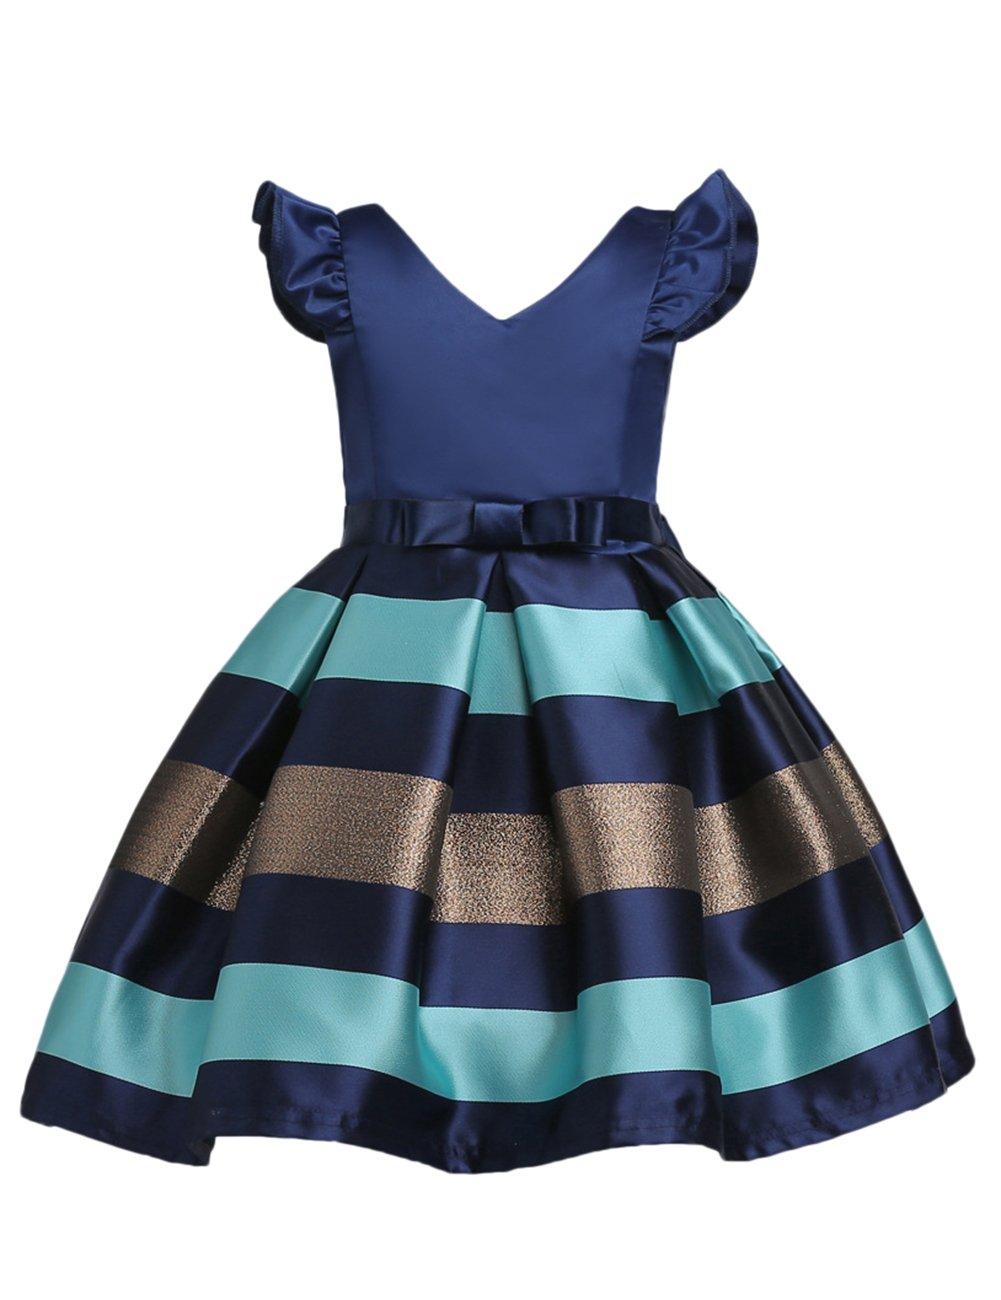 Gprince Girl Clothing Princess Dress Sleeveless Stripe V-shape Kids Party Gift